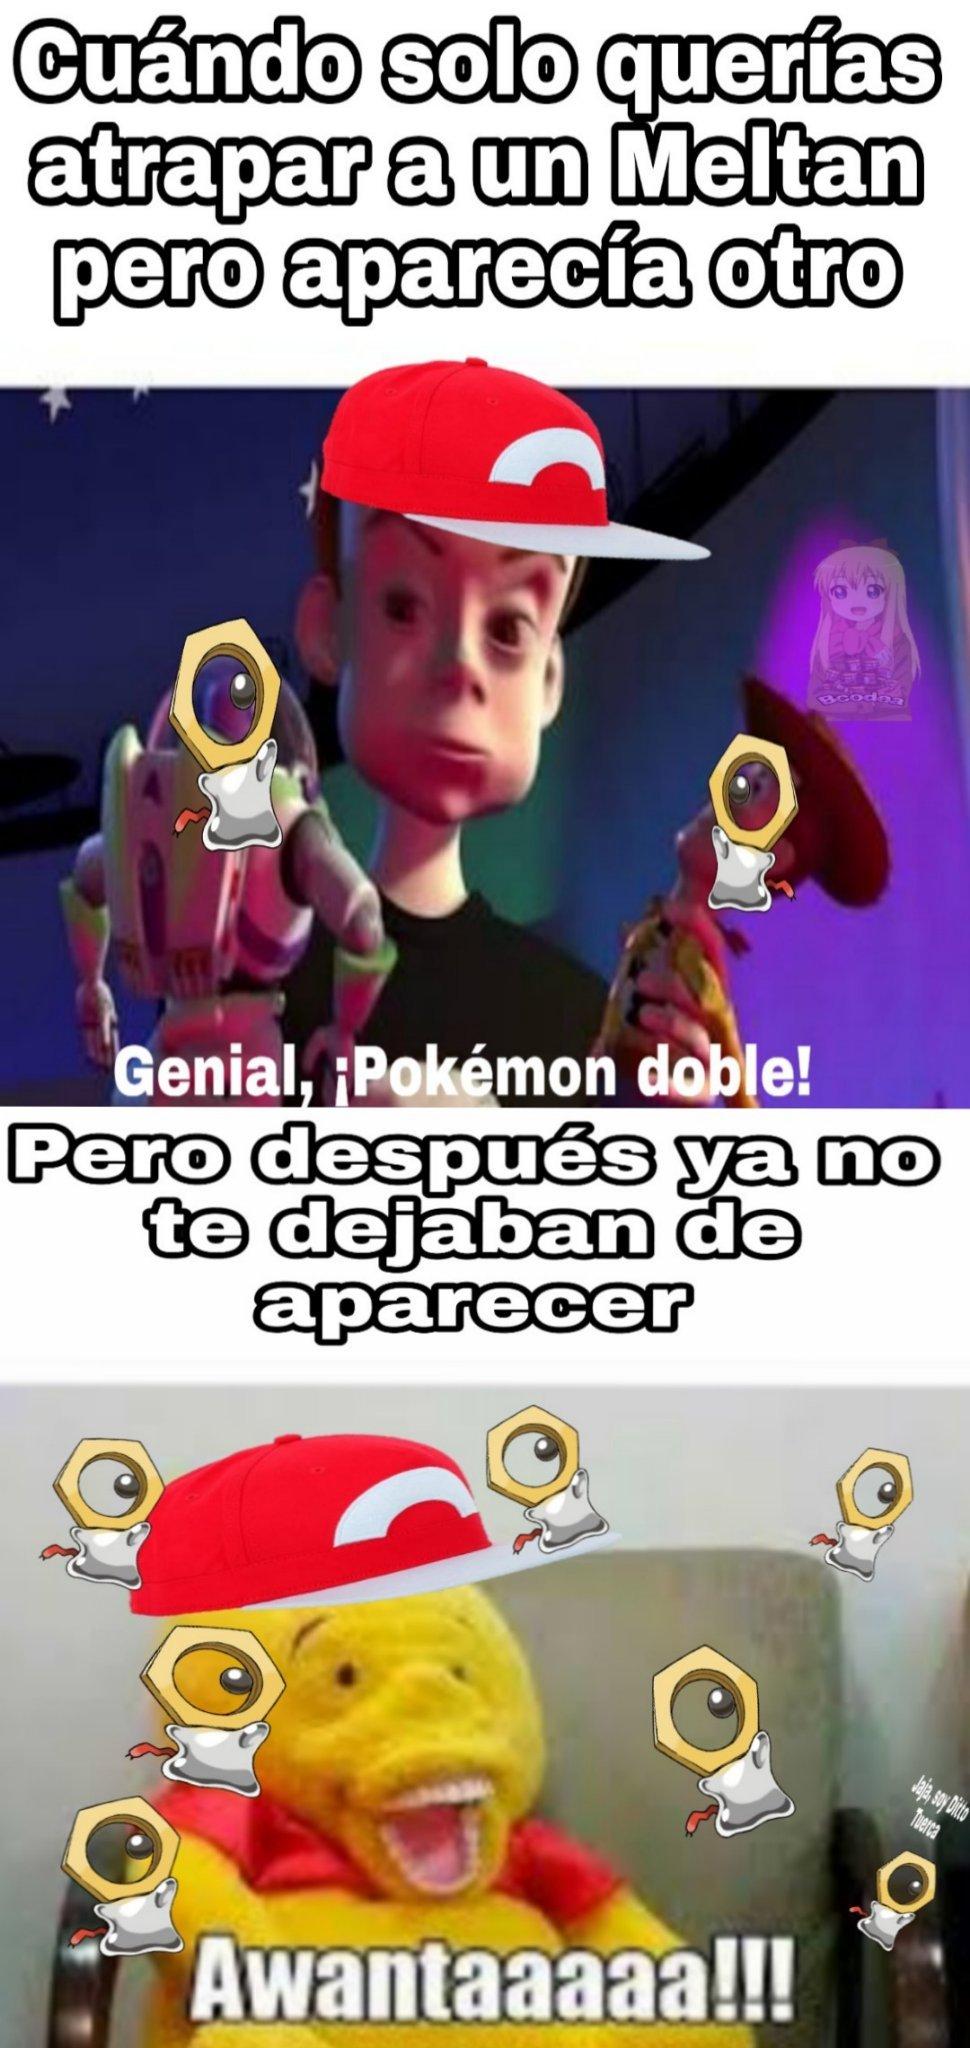 3 memes seguidos de Pokémon